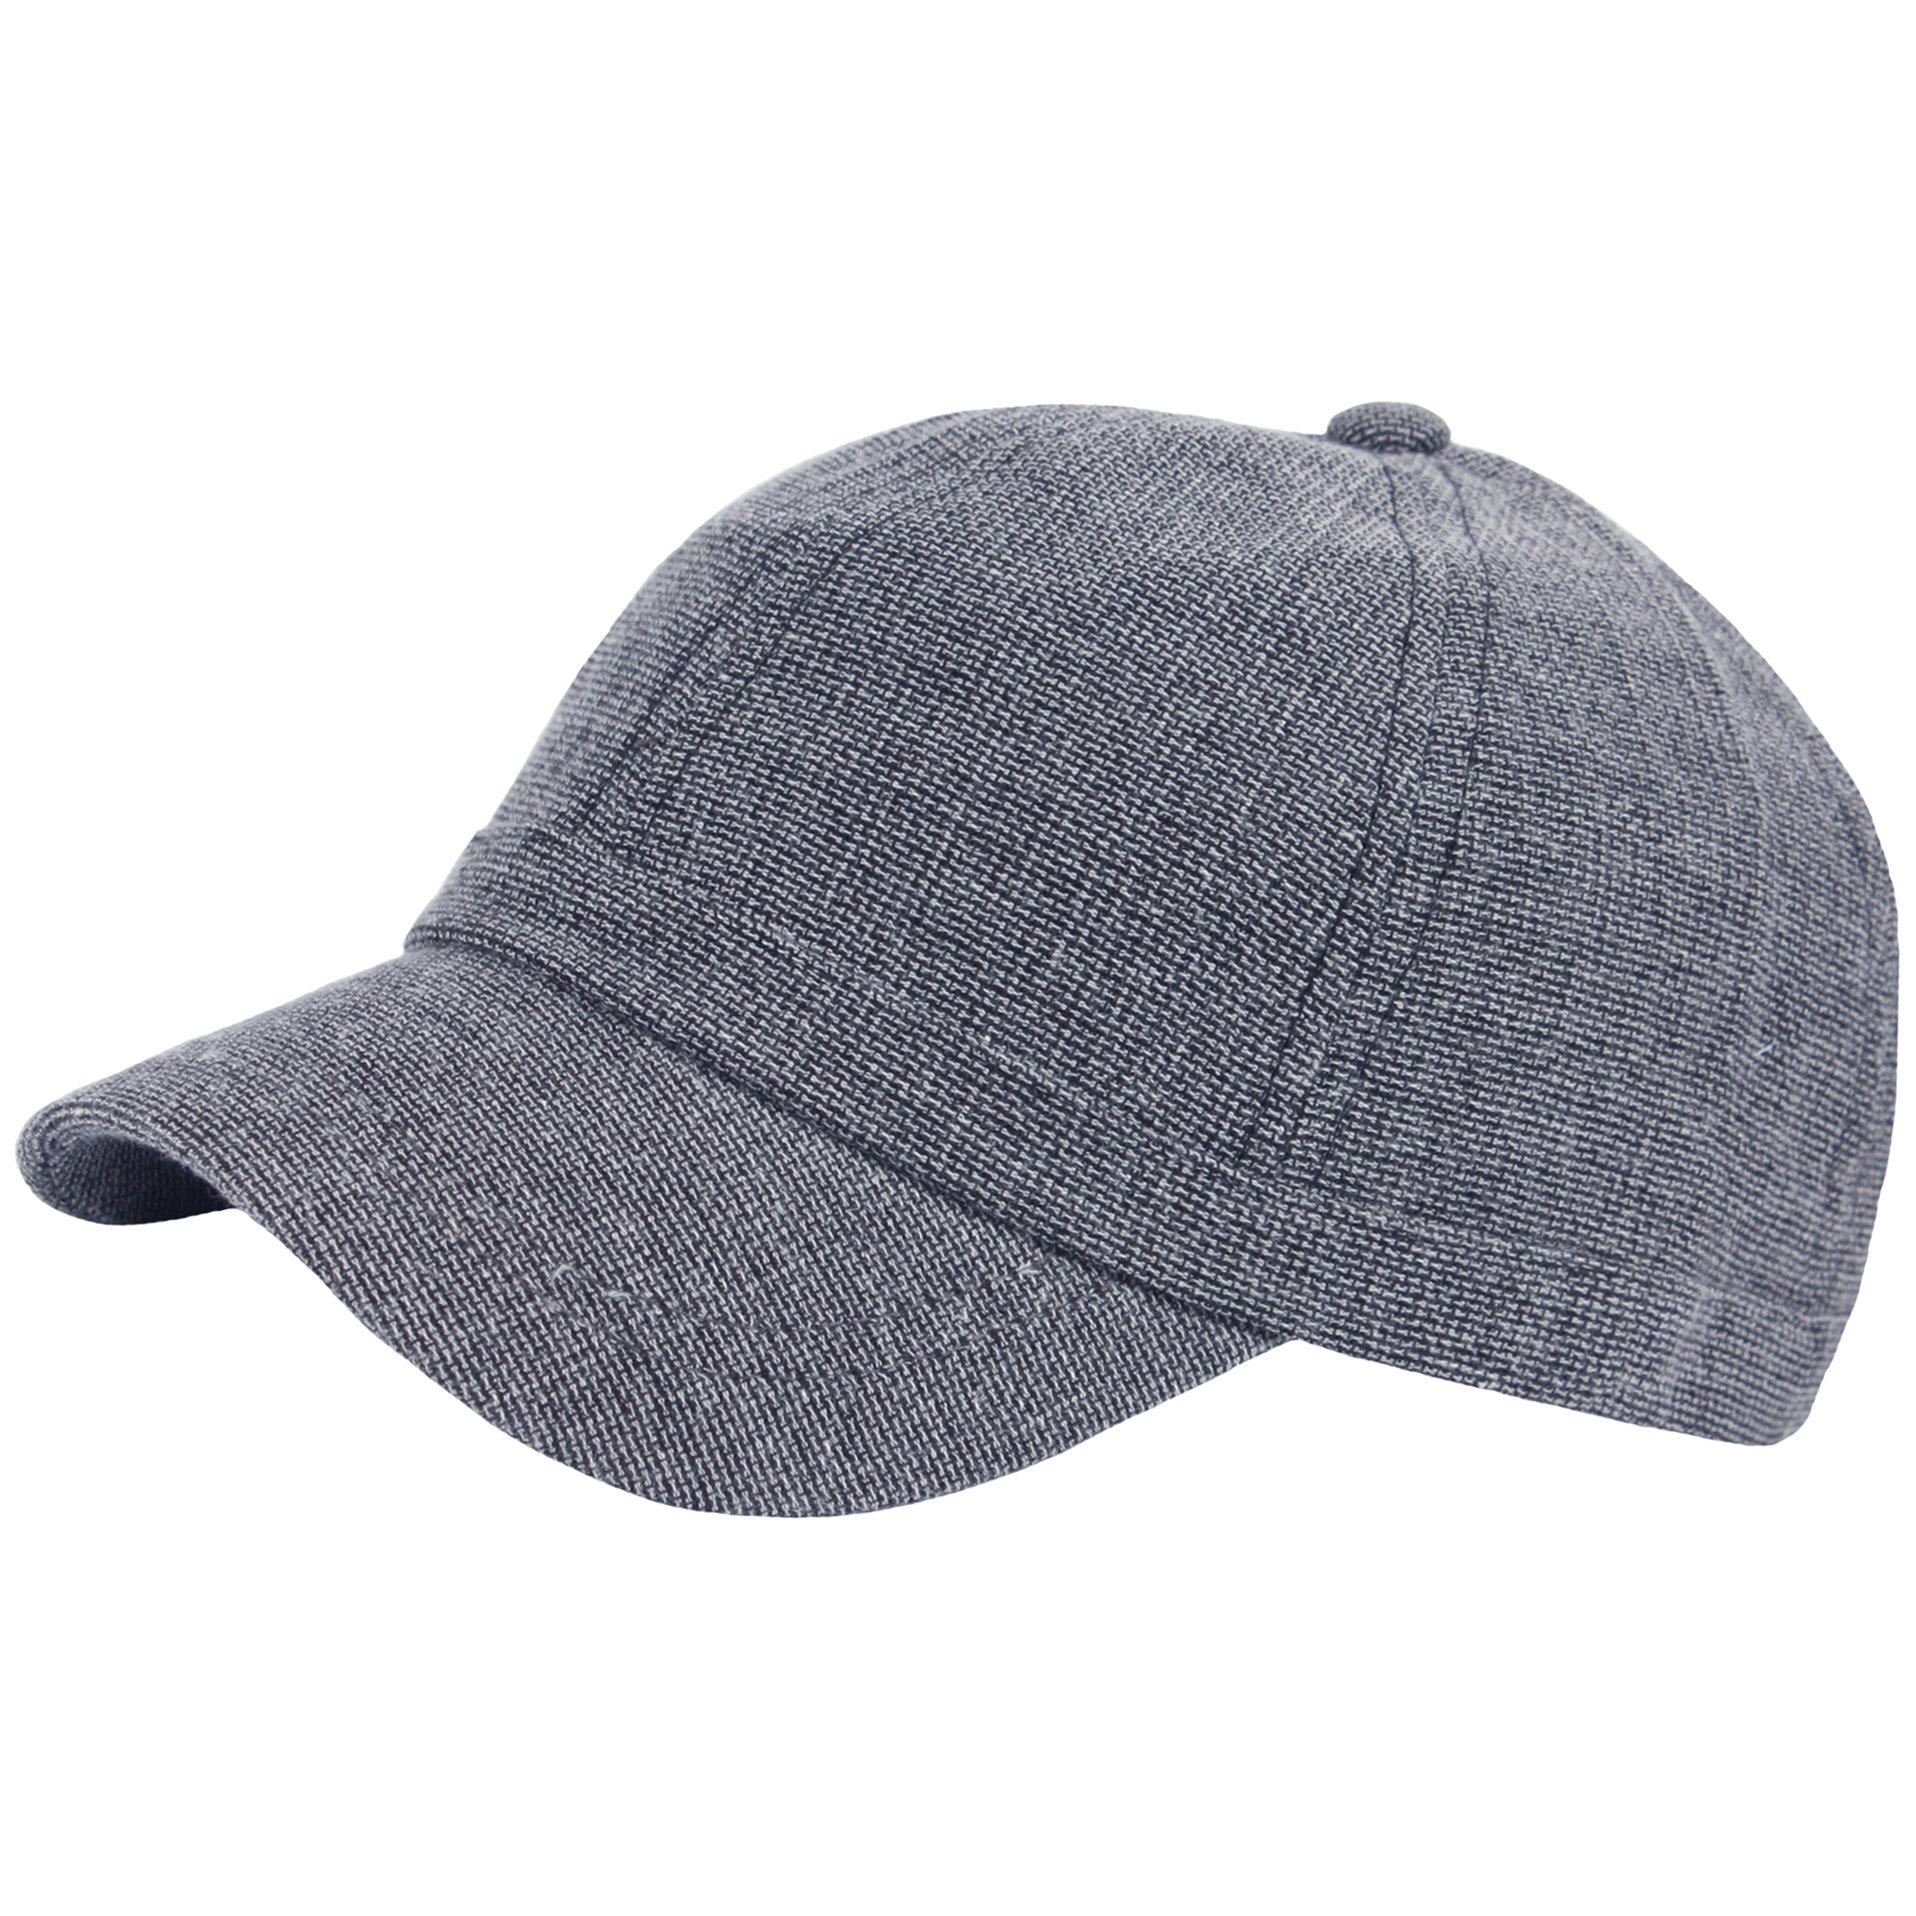 RaOn B382 Ball Cap Plain Empty Summer Cool Short Bill Design Baseball Hat Truckers (Gray)